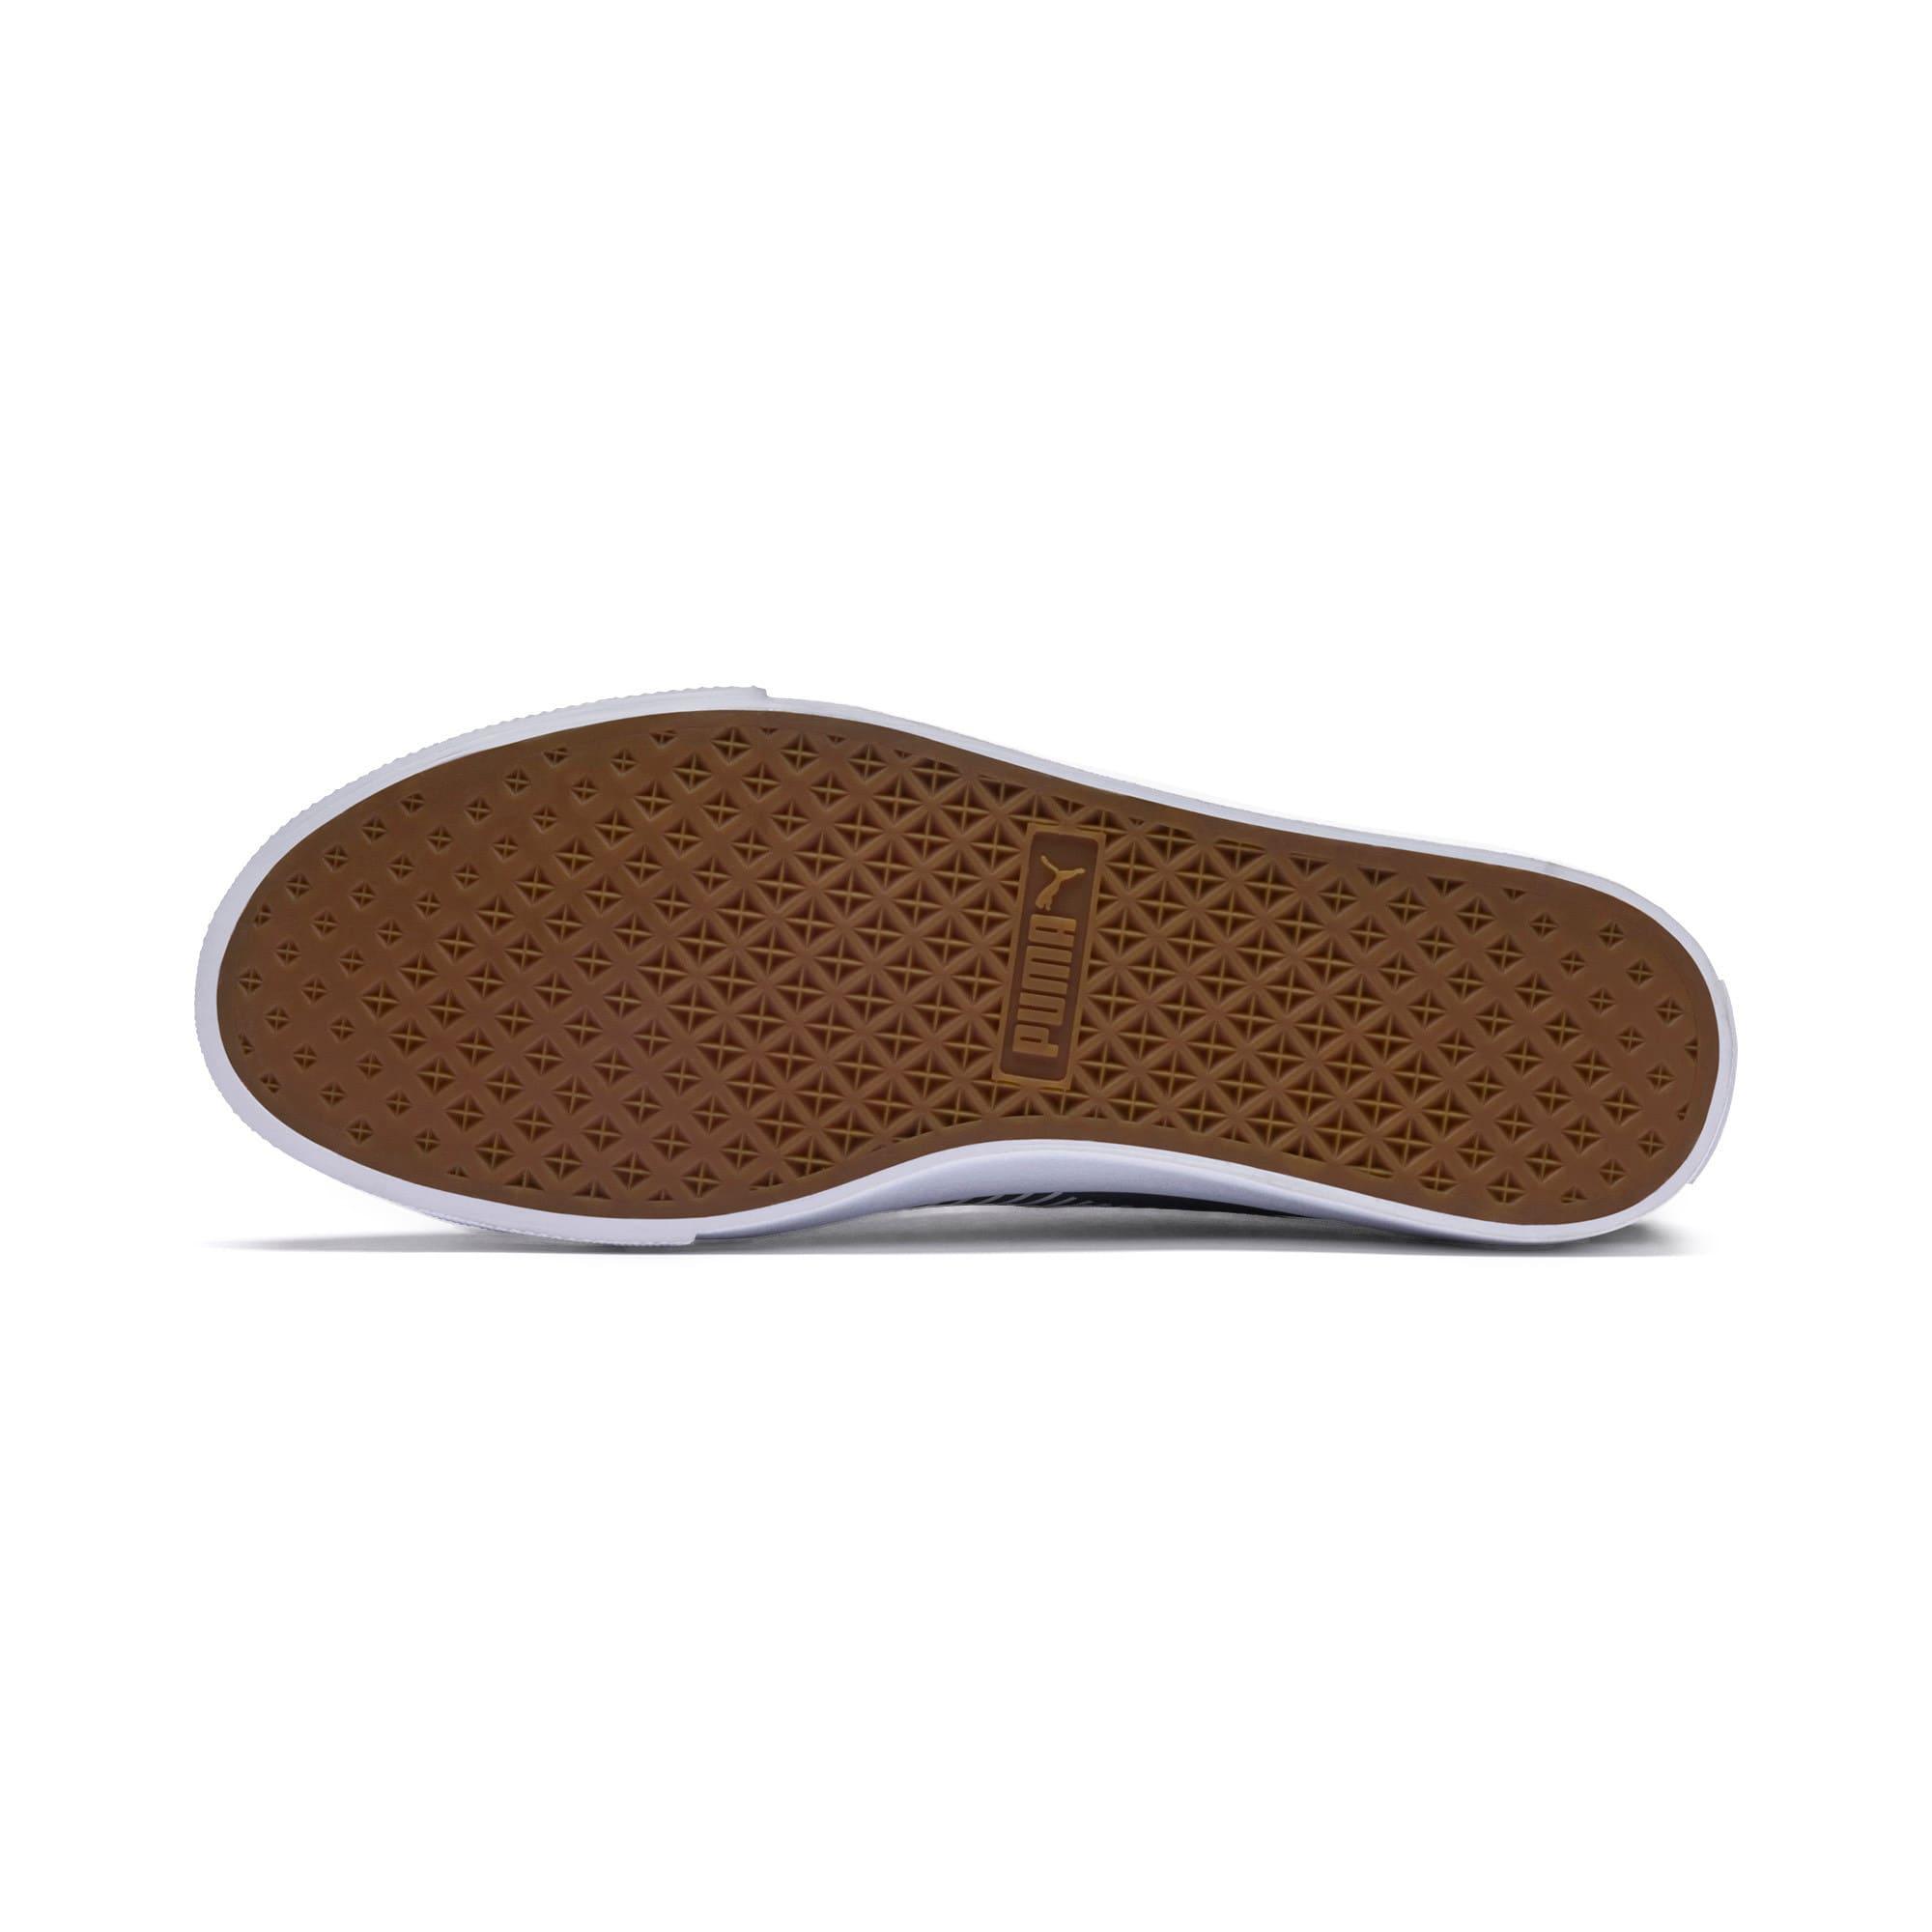 Thumbnail 4 of Bari Sneakers, Charcoal Gray-Puma White, medium-IND